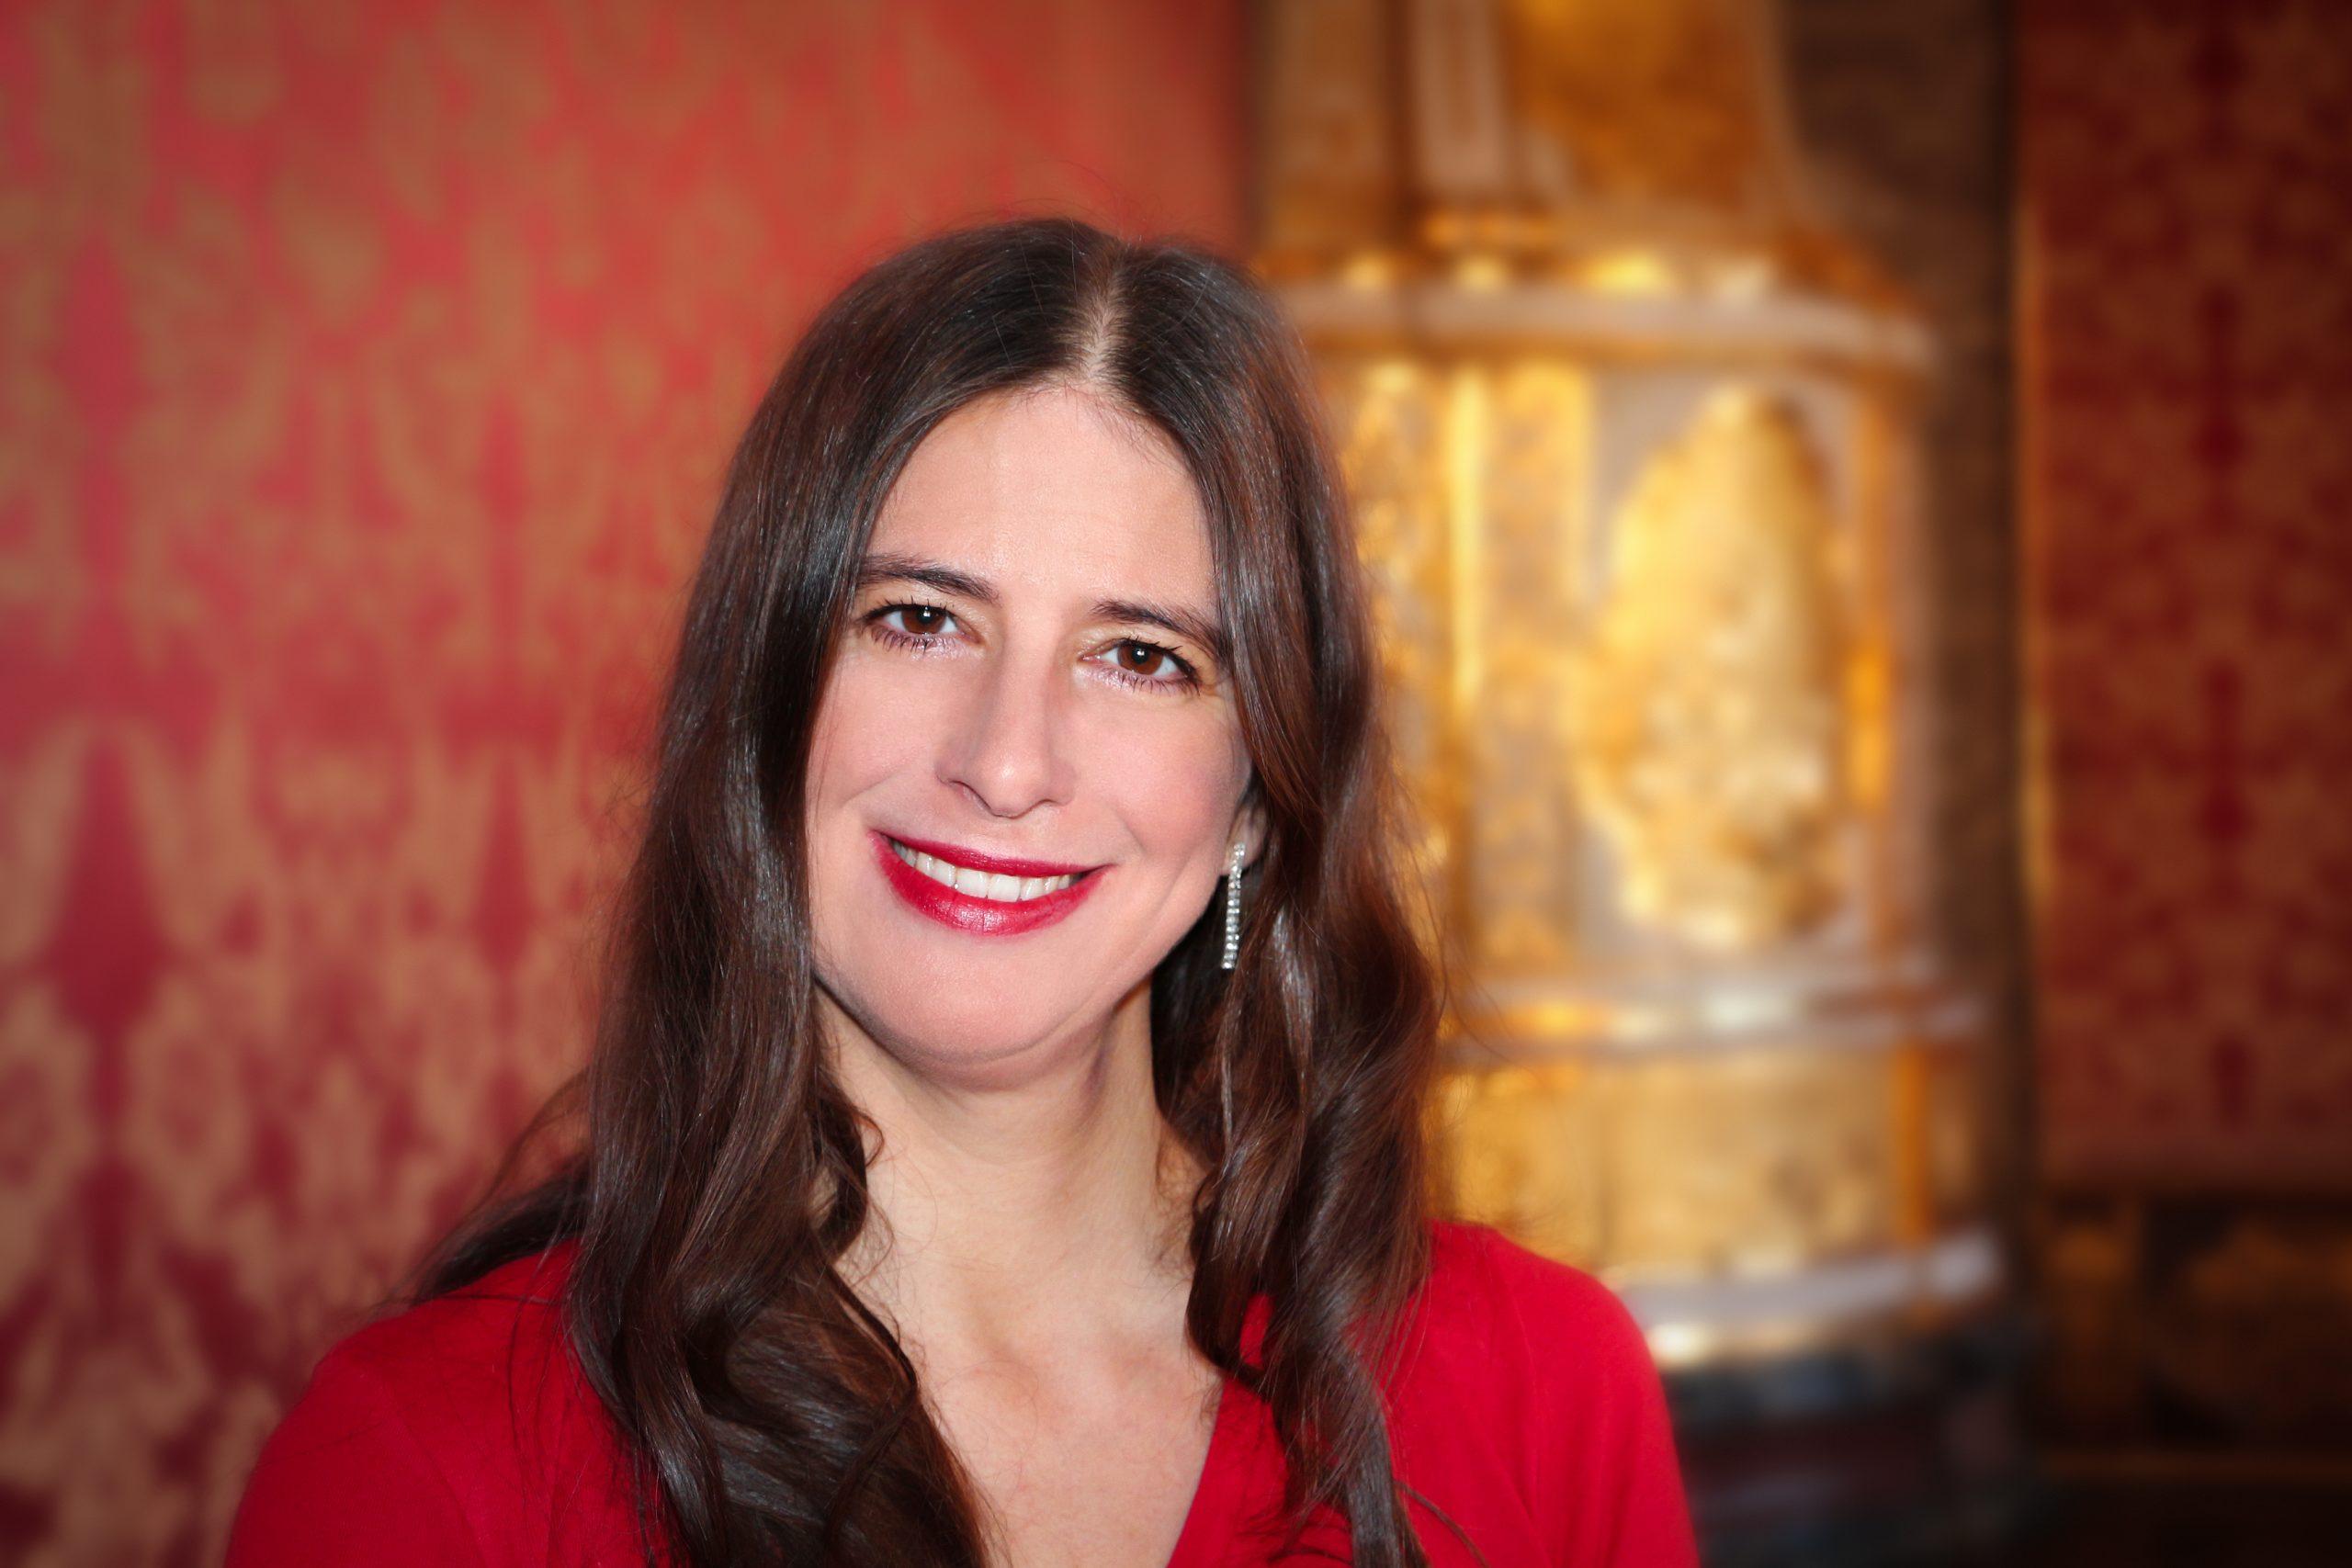 Henriette Hofmann